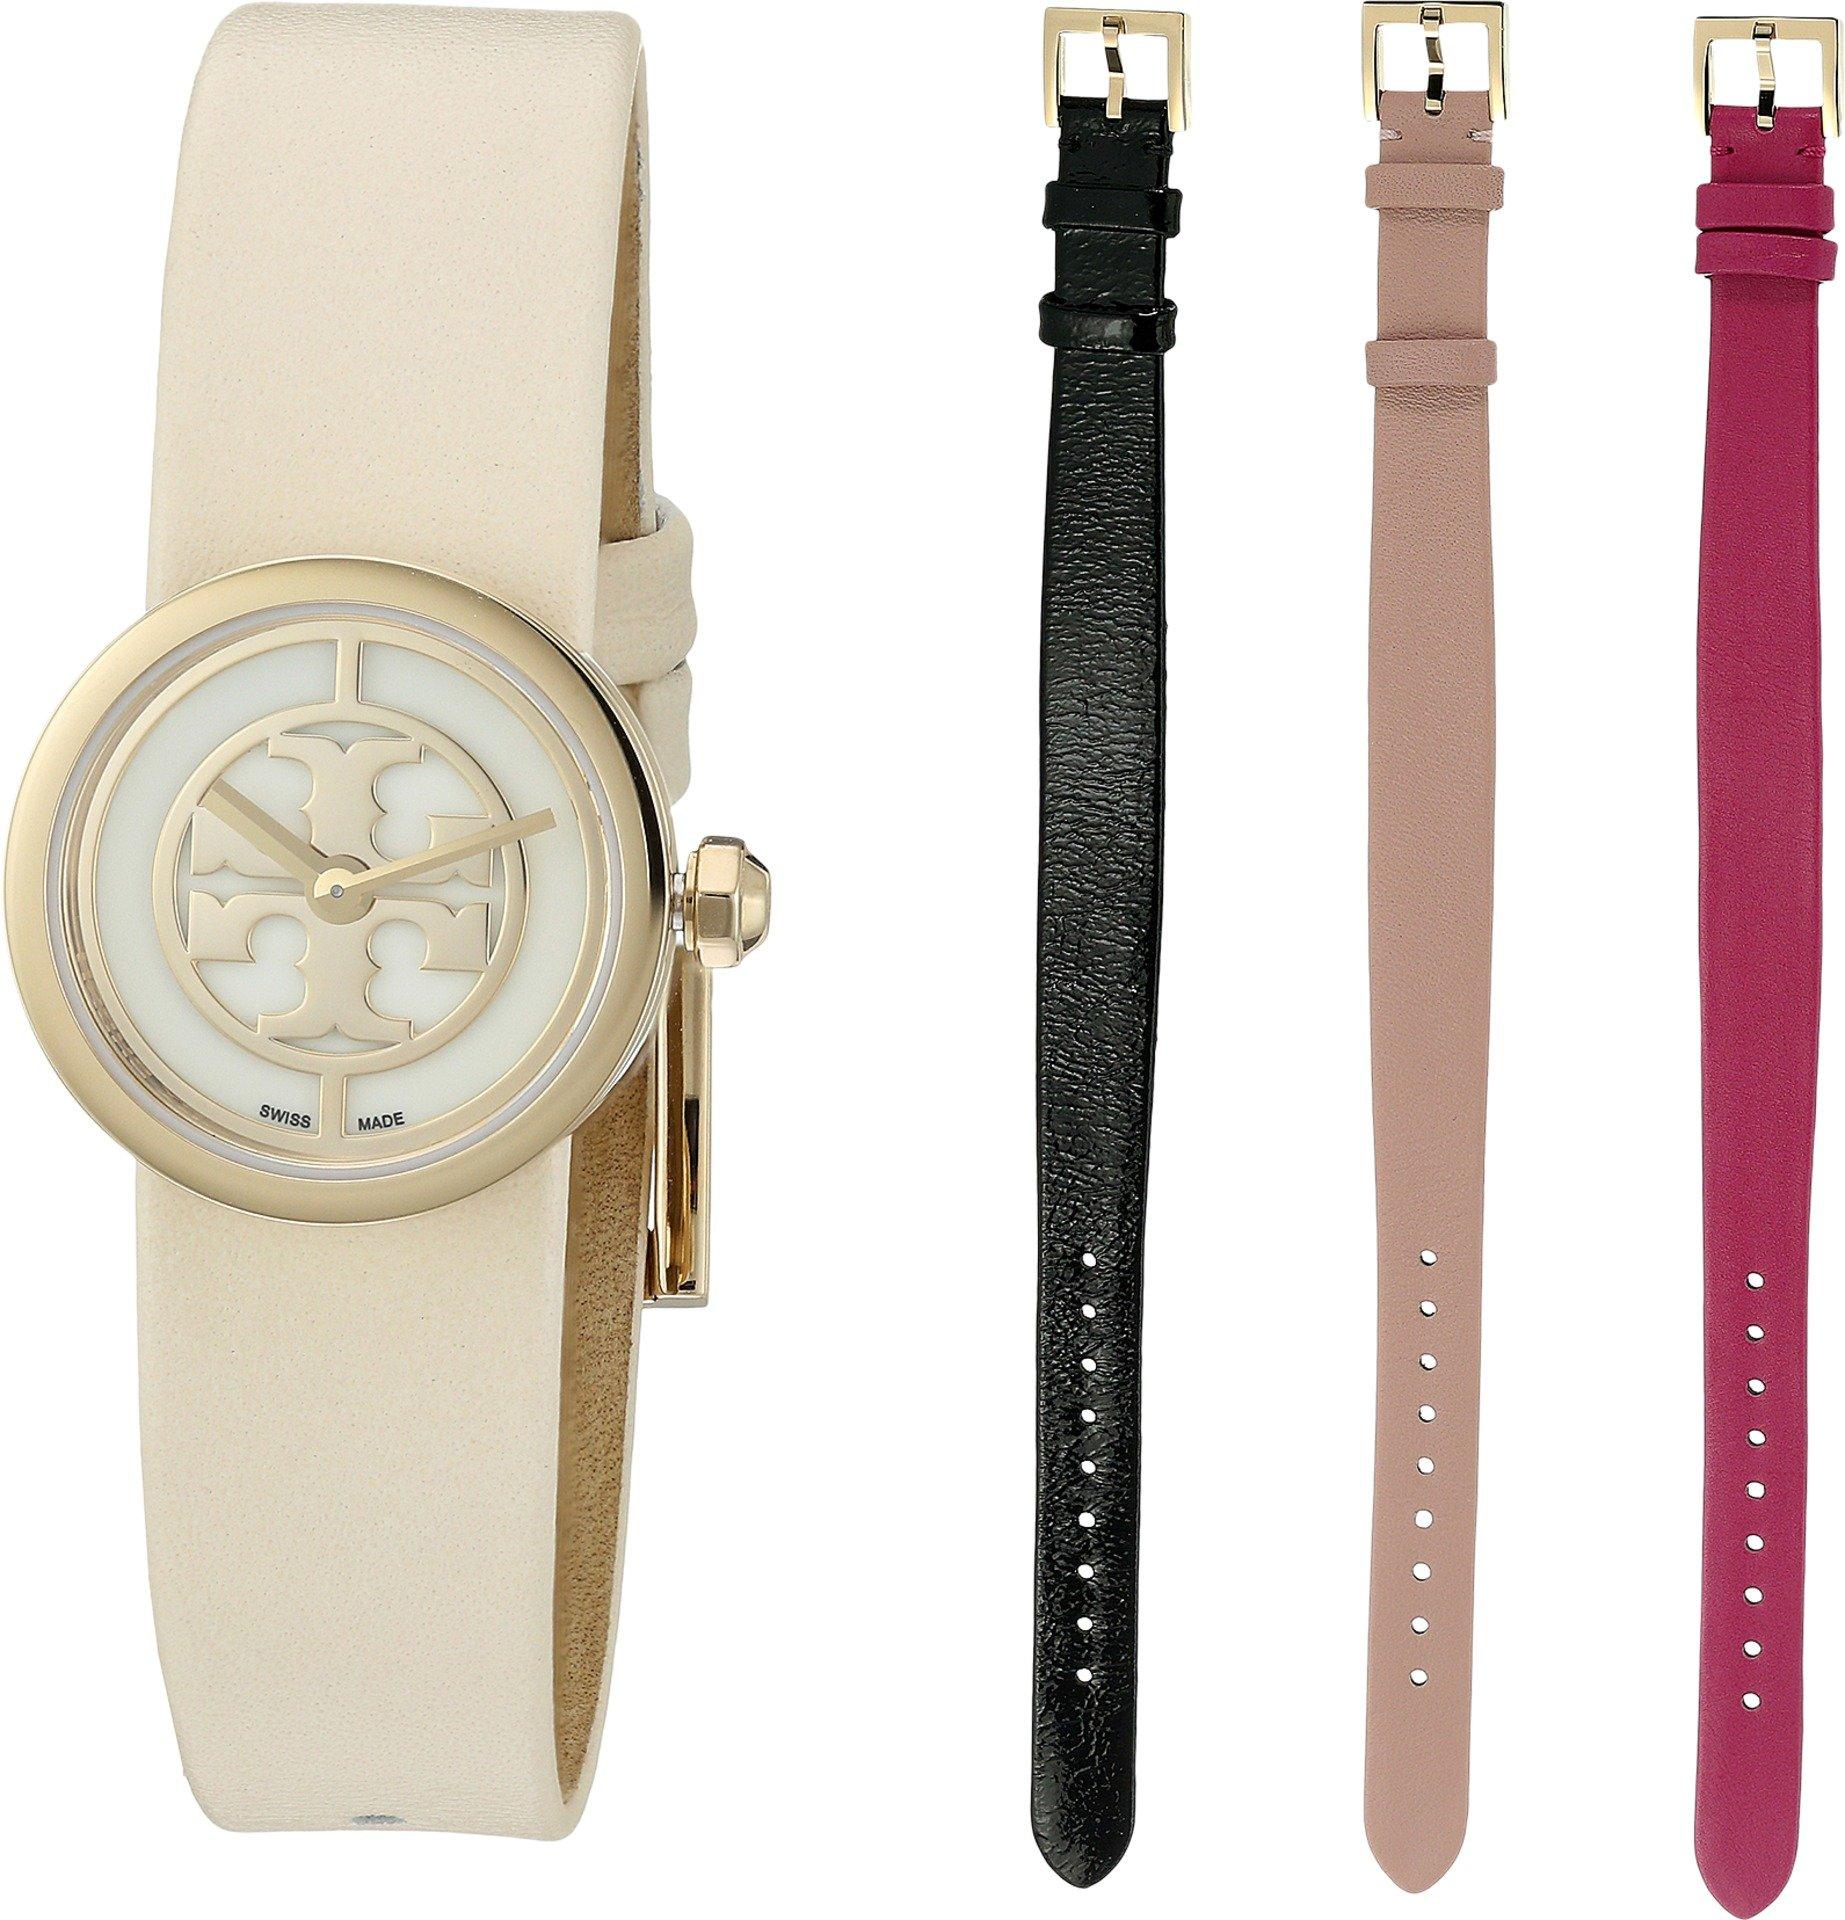 Tory Burch Women's Reva Watch Gift Set - TB4042 Multicolor